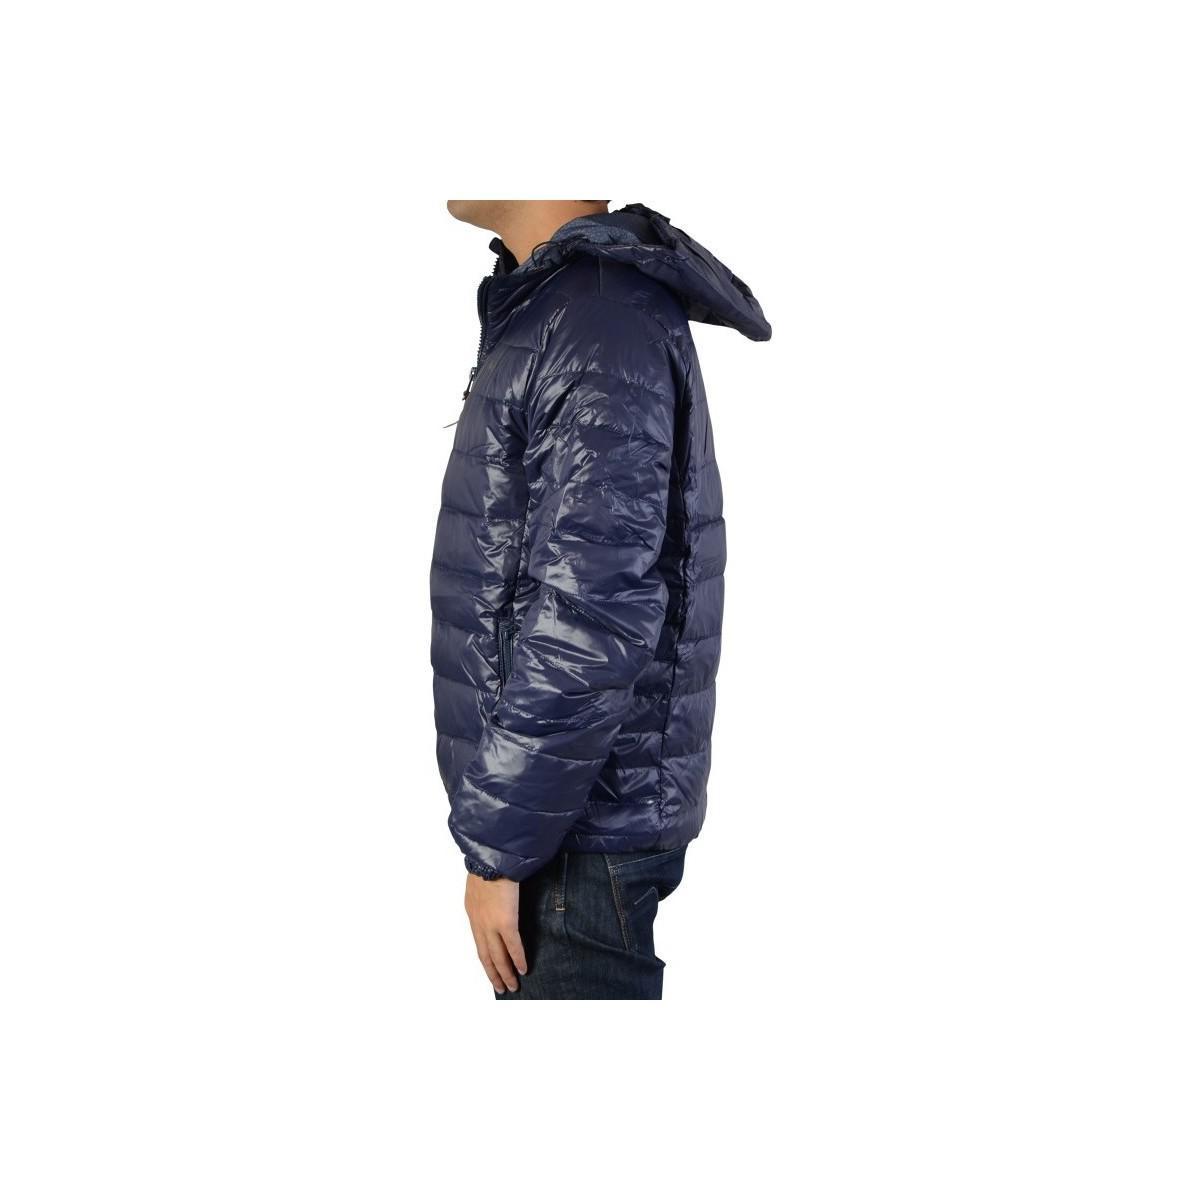 Pepe jeans Doudoune Galdor Thames Pm401256 Men s Jacket In Purple in ... f5b59b263896